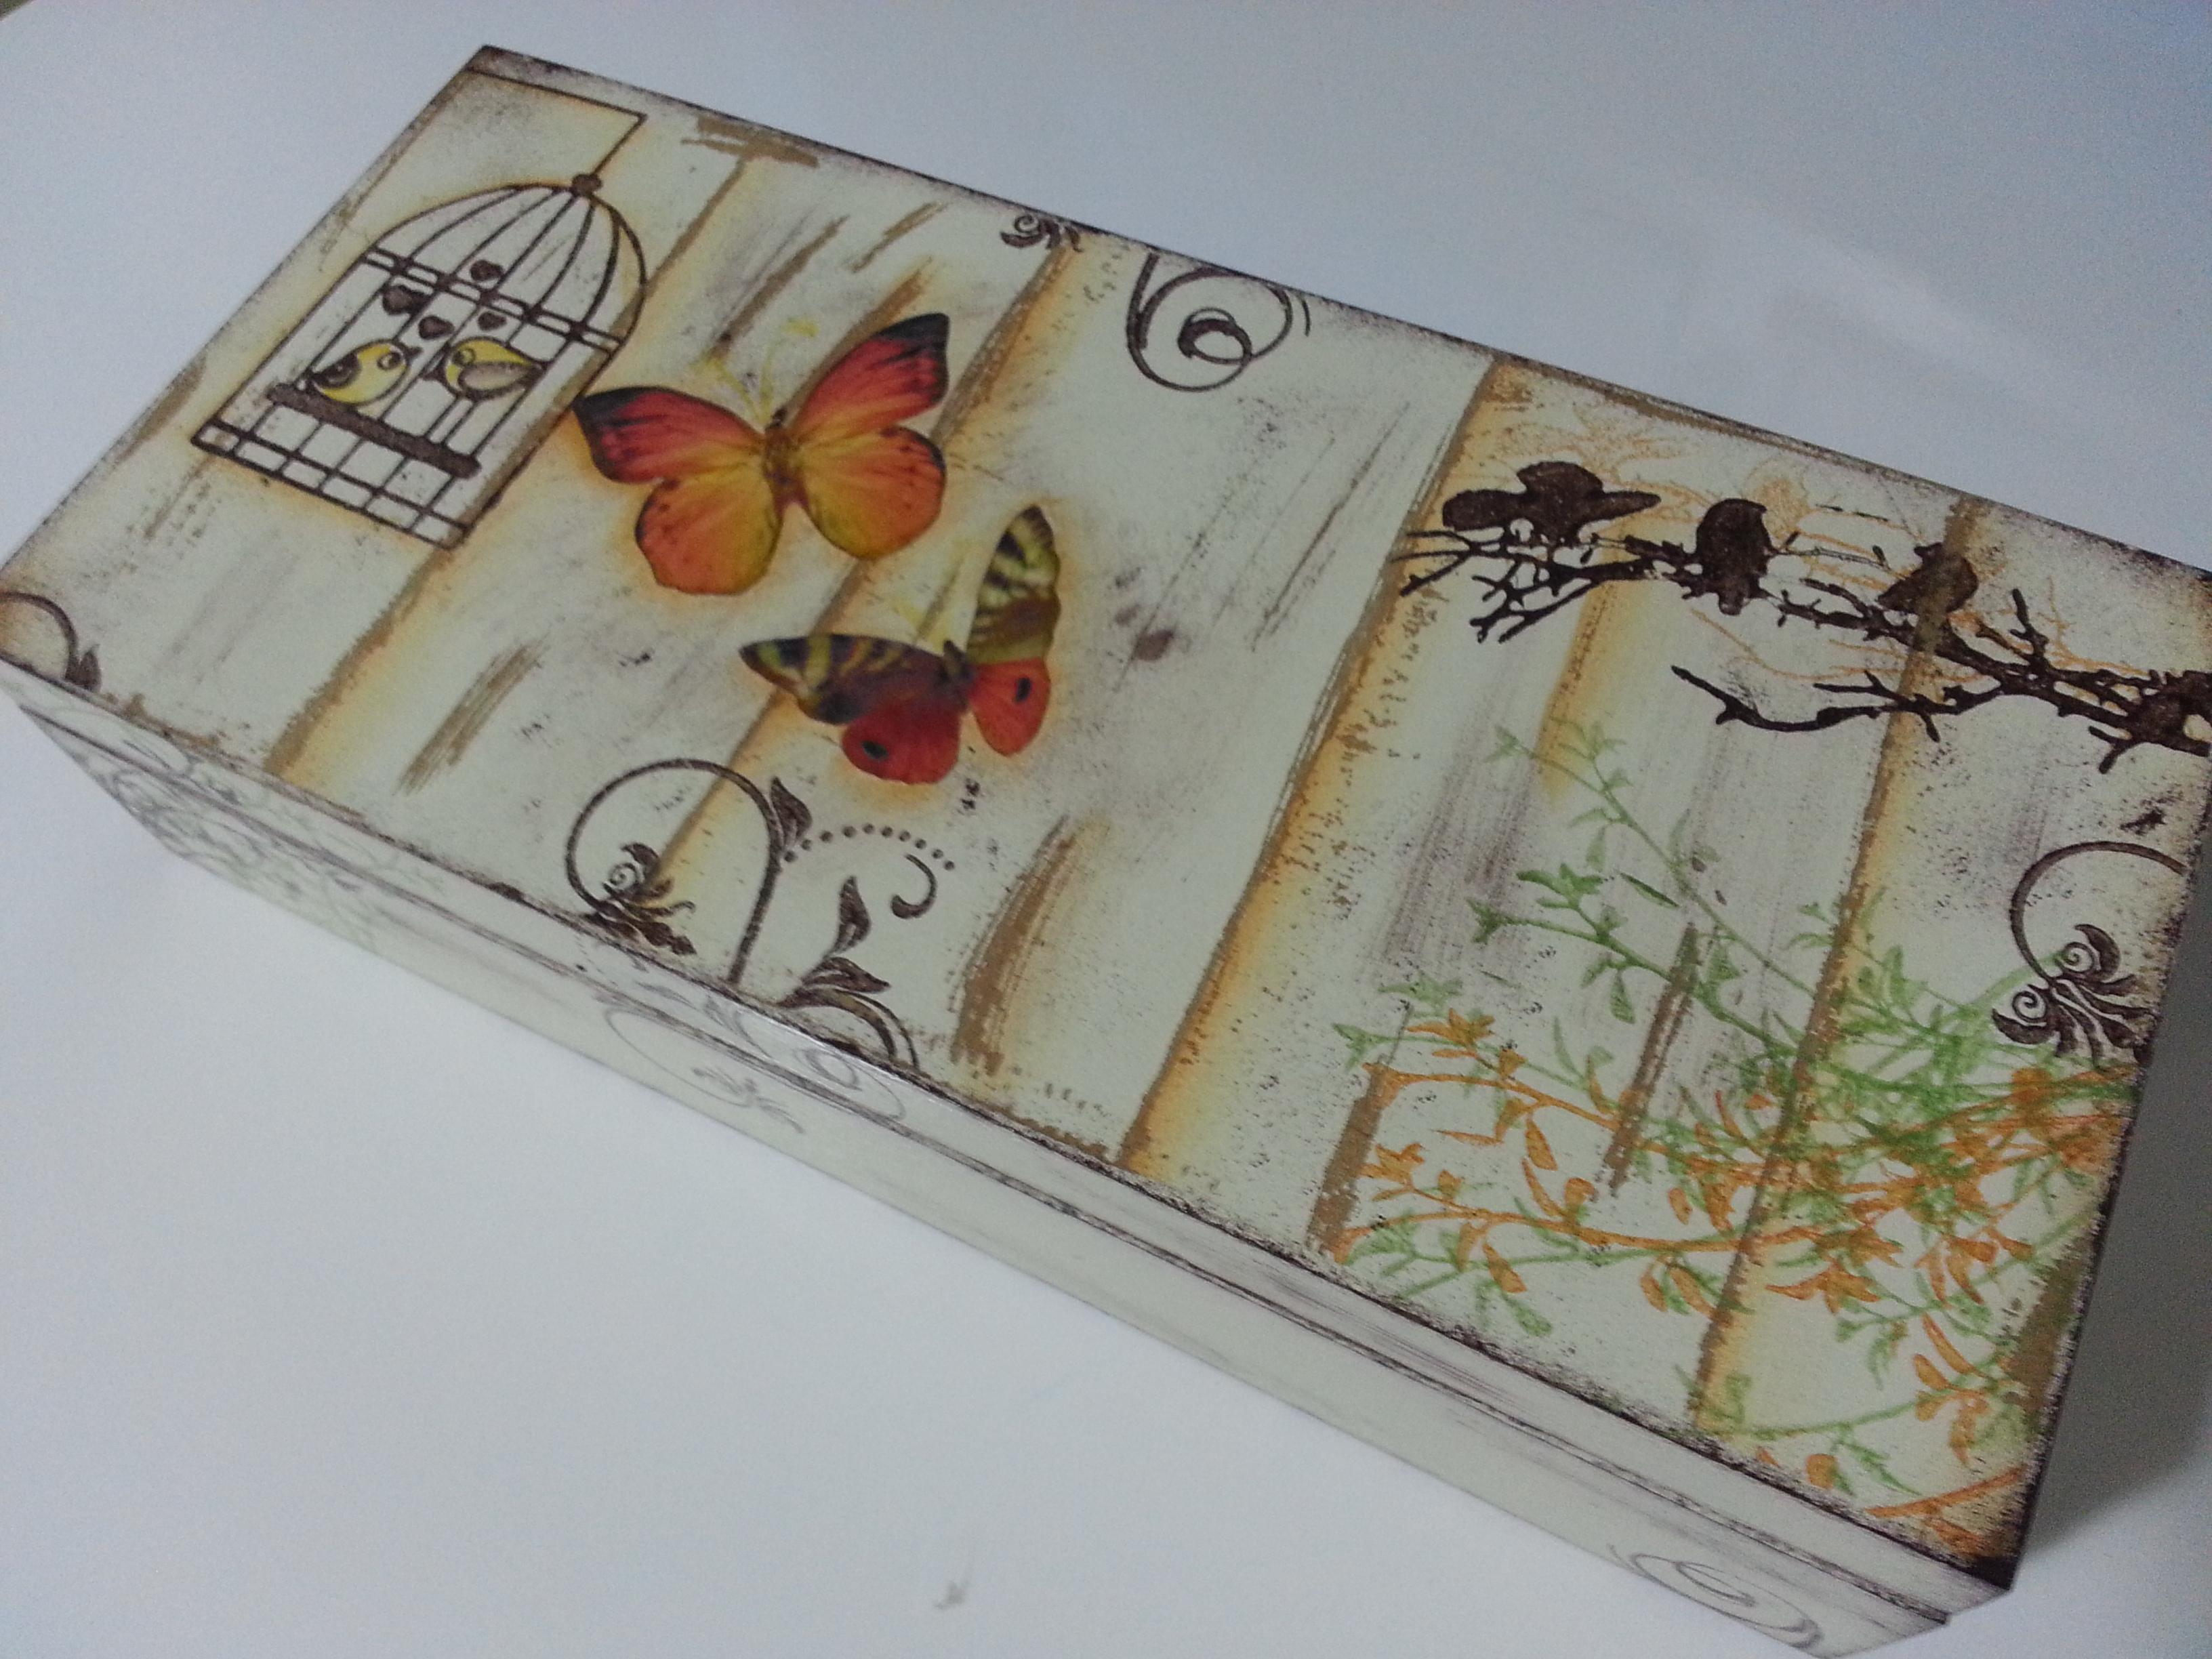 caixa porta relogios caixa porta relogios caixa porta relogios caixa #6D4430 3264x2448